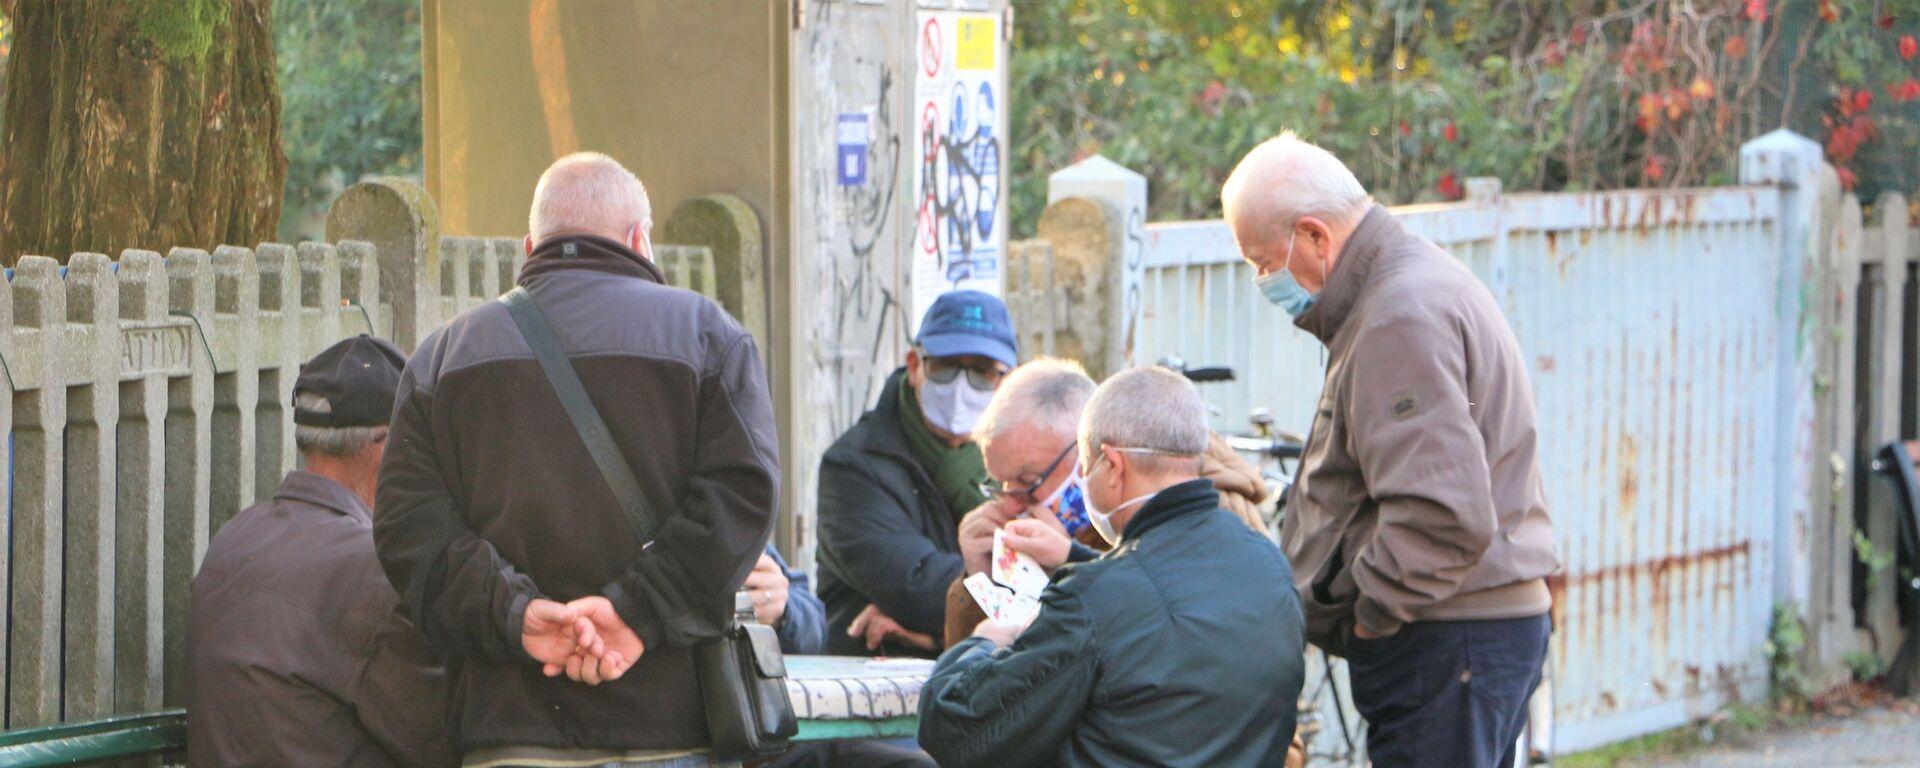 I pensionati giocano a carte in una strada  - Sputnik Italia, 1920, 18.06.2021